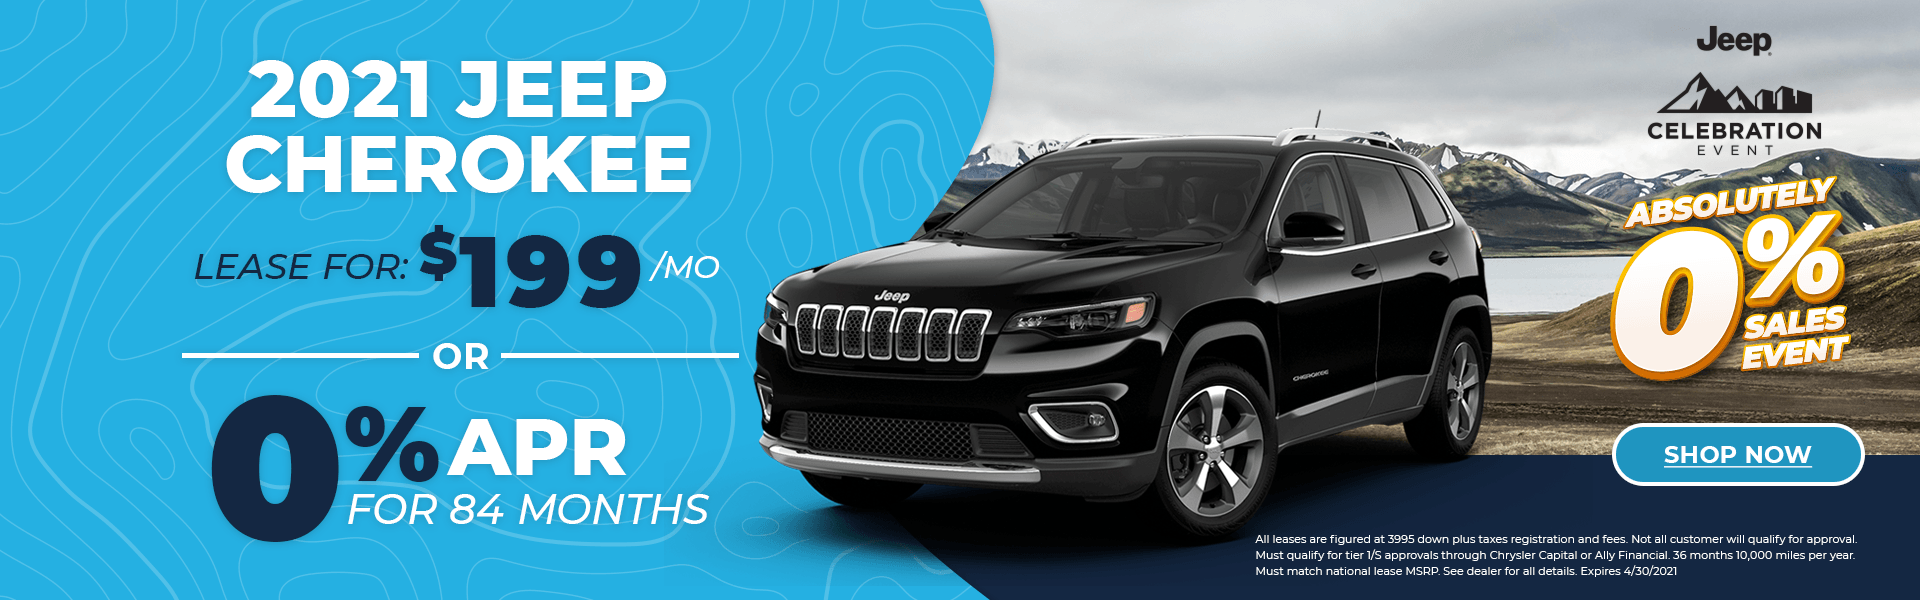 2021 New Cherokee – Jeep Celebration Event Alt